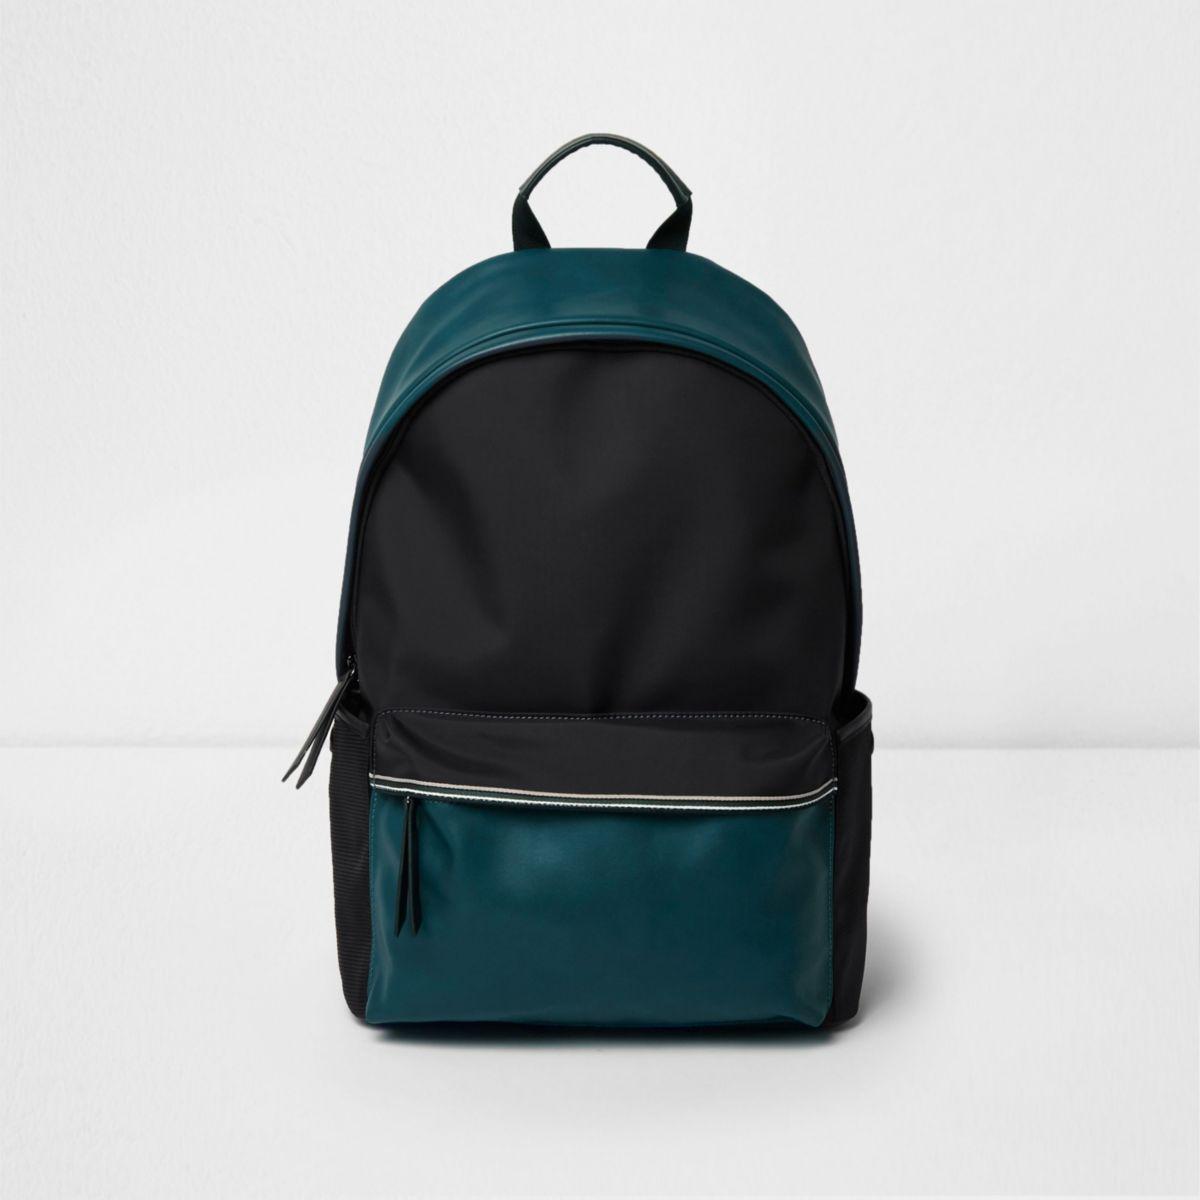 Schwarzer Rucksack in Blockfarben